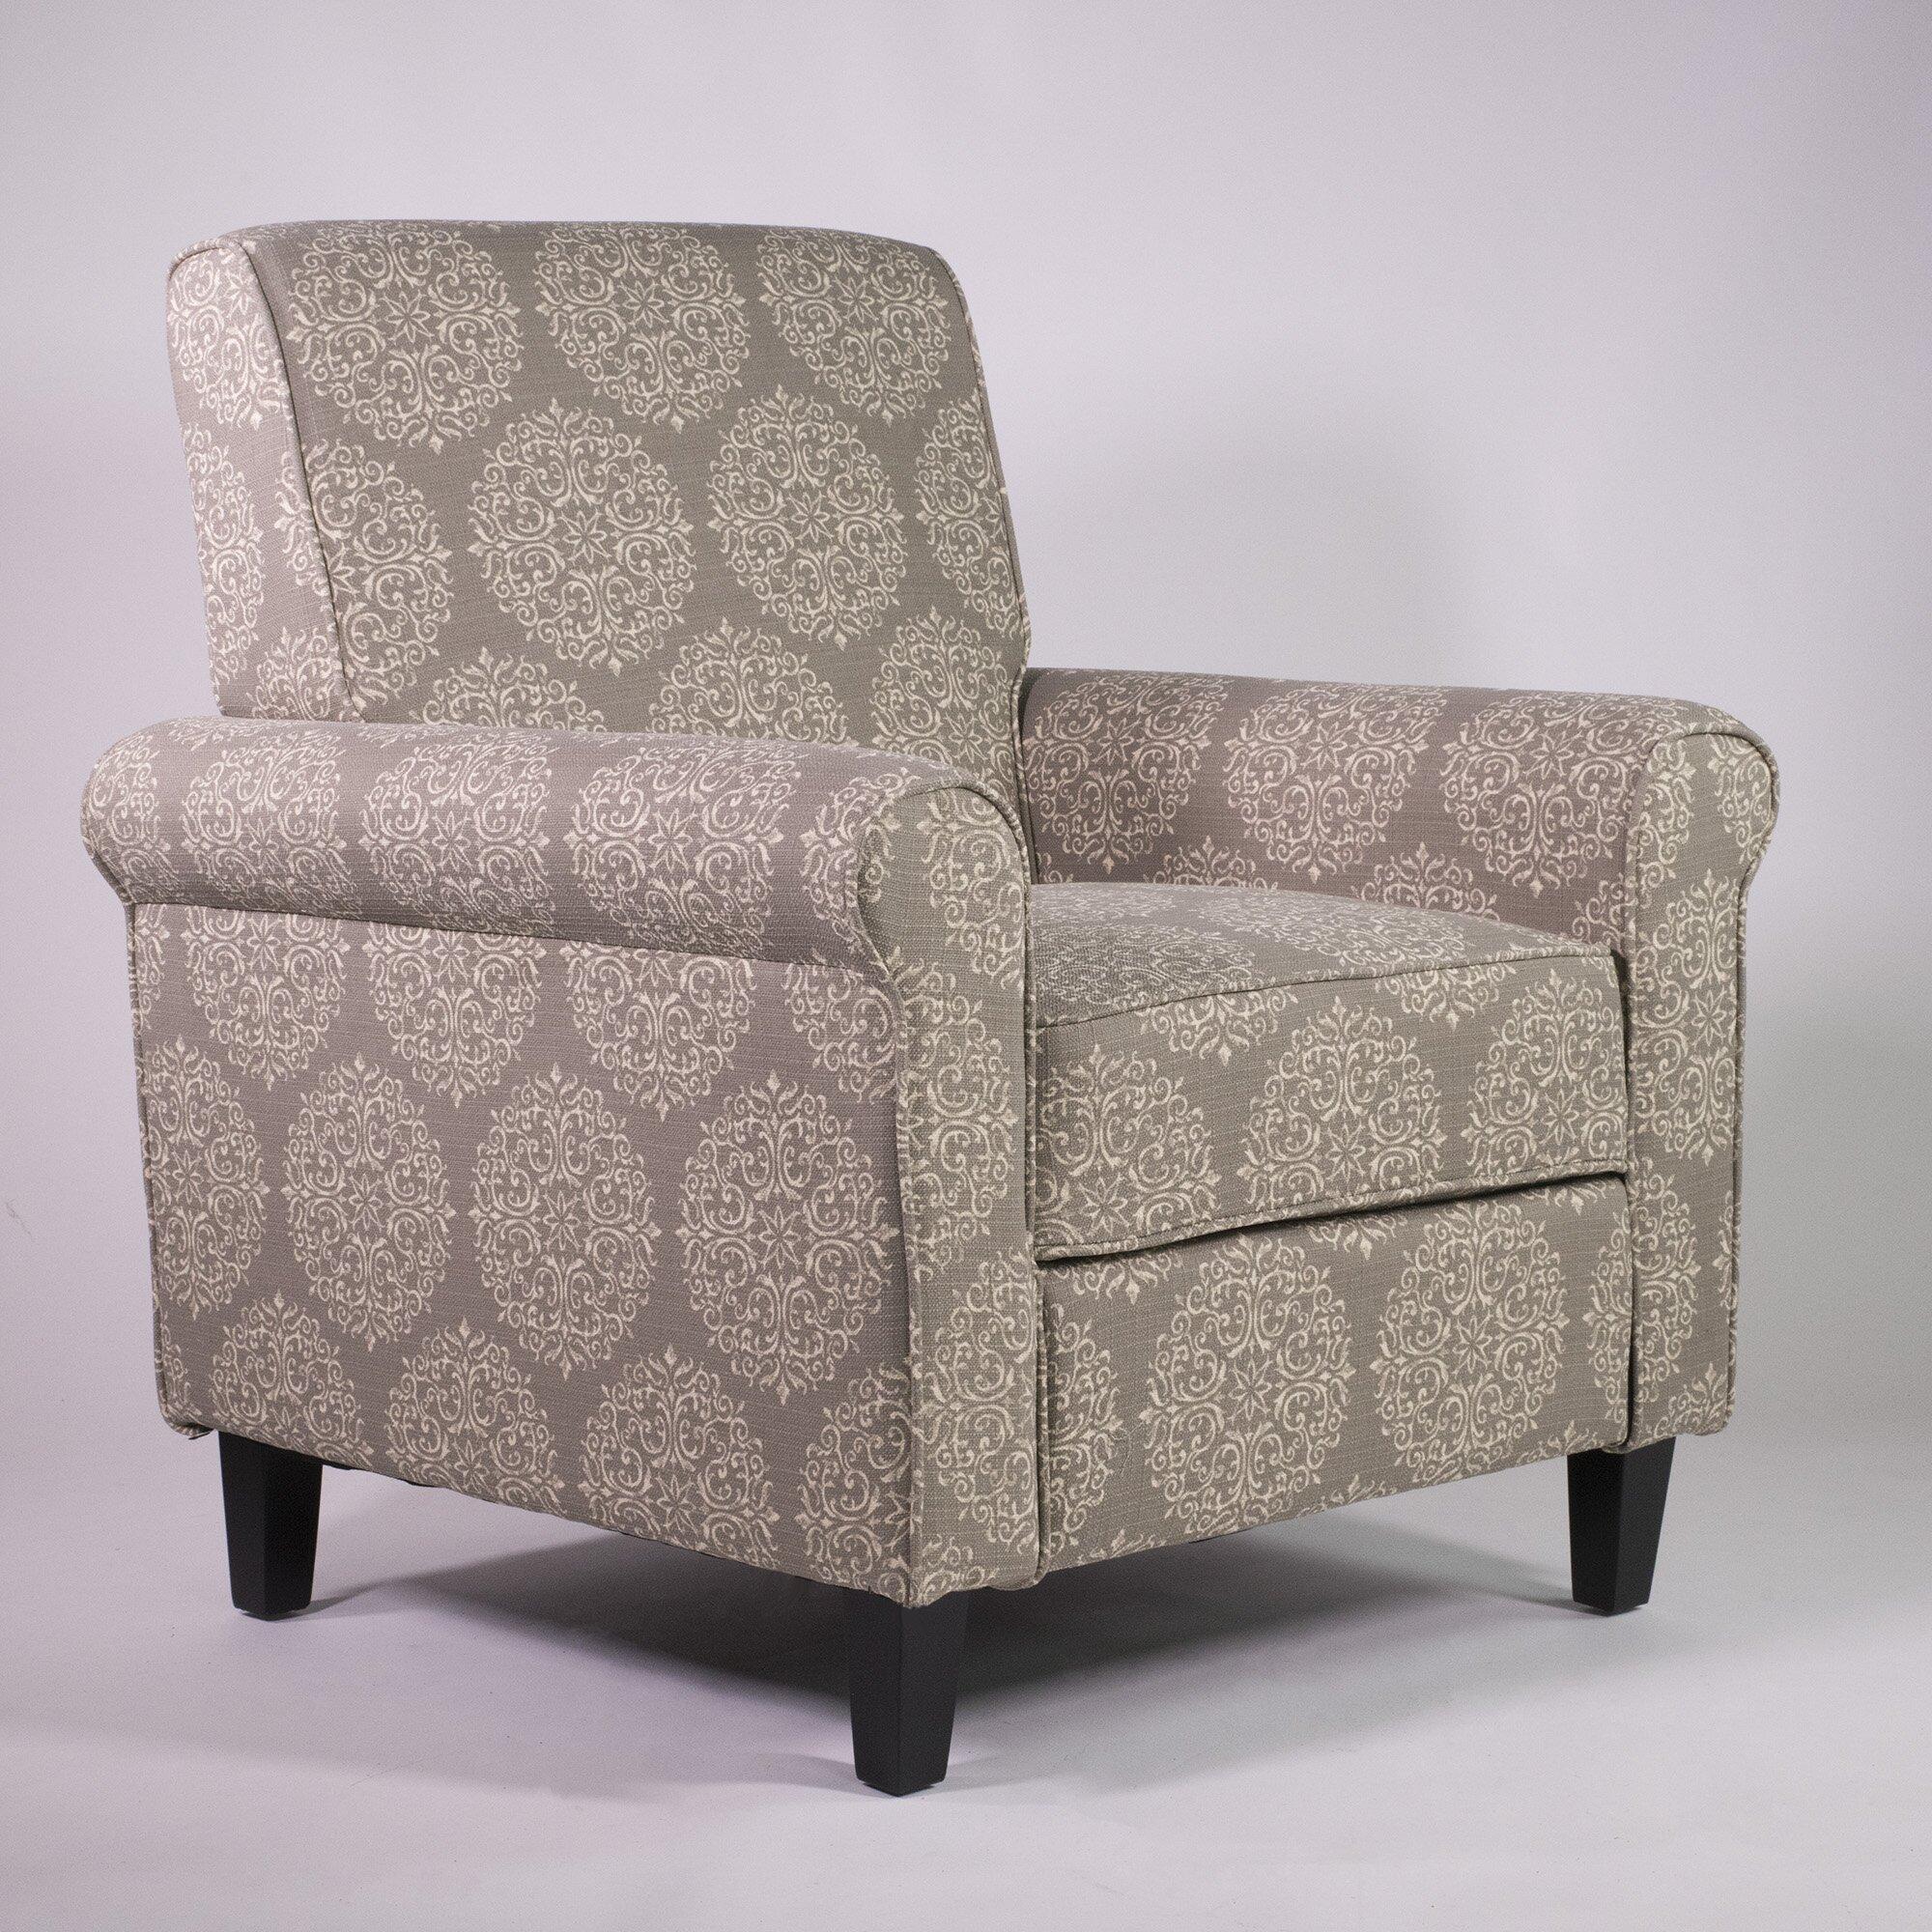 OceanBridge Fingers Arm Chair Wayfair